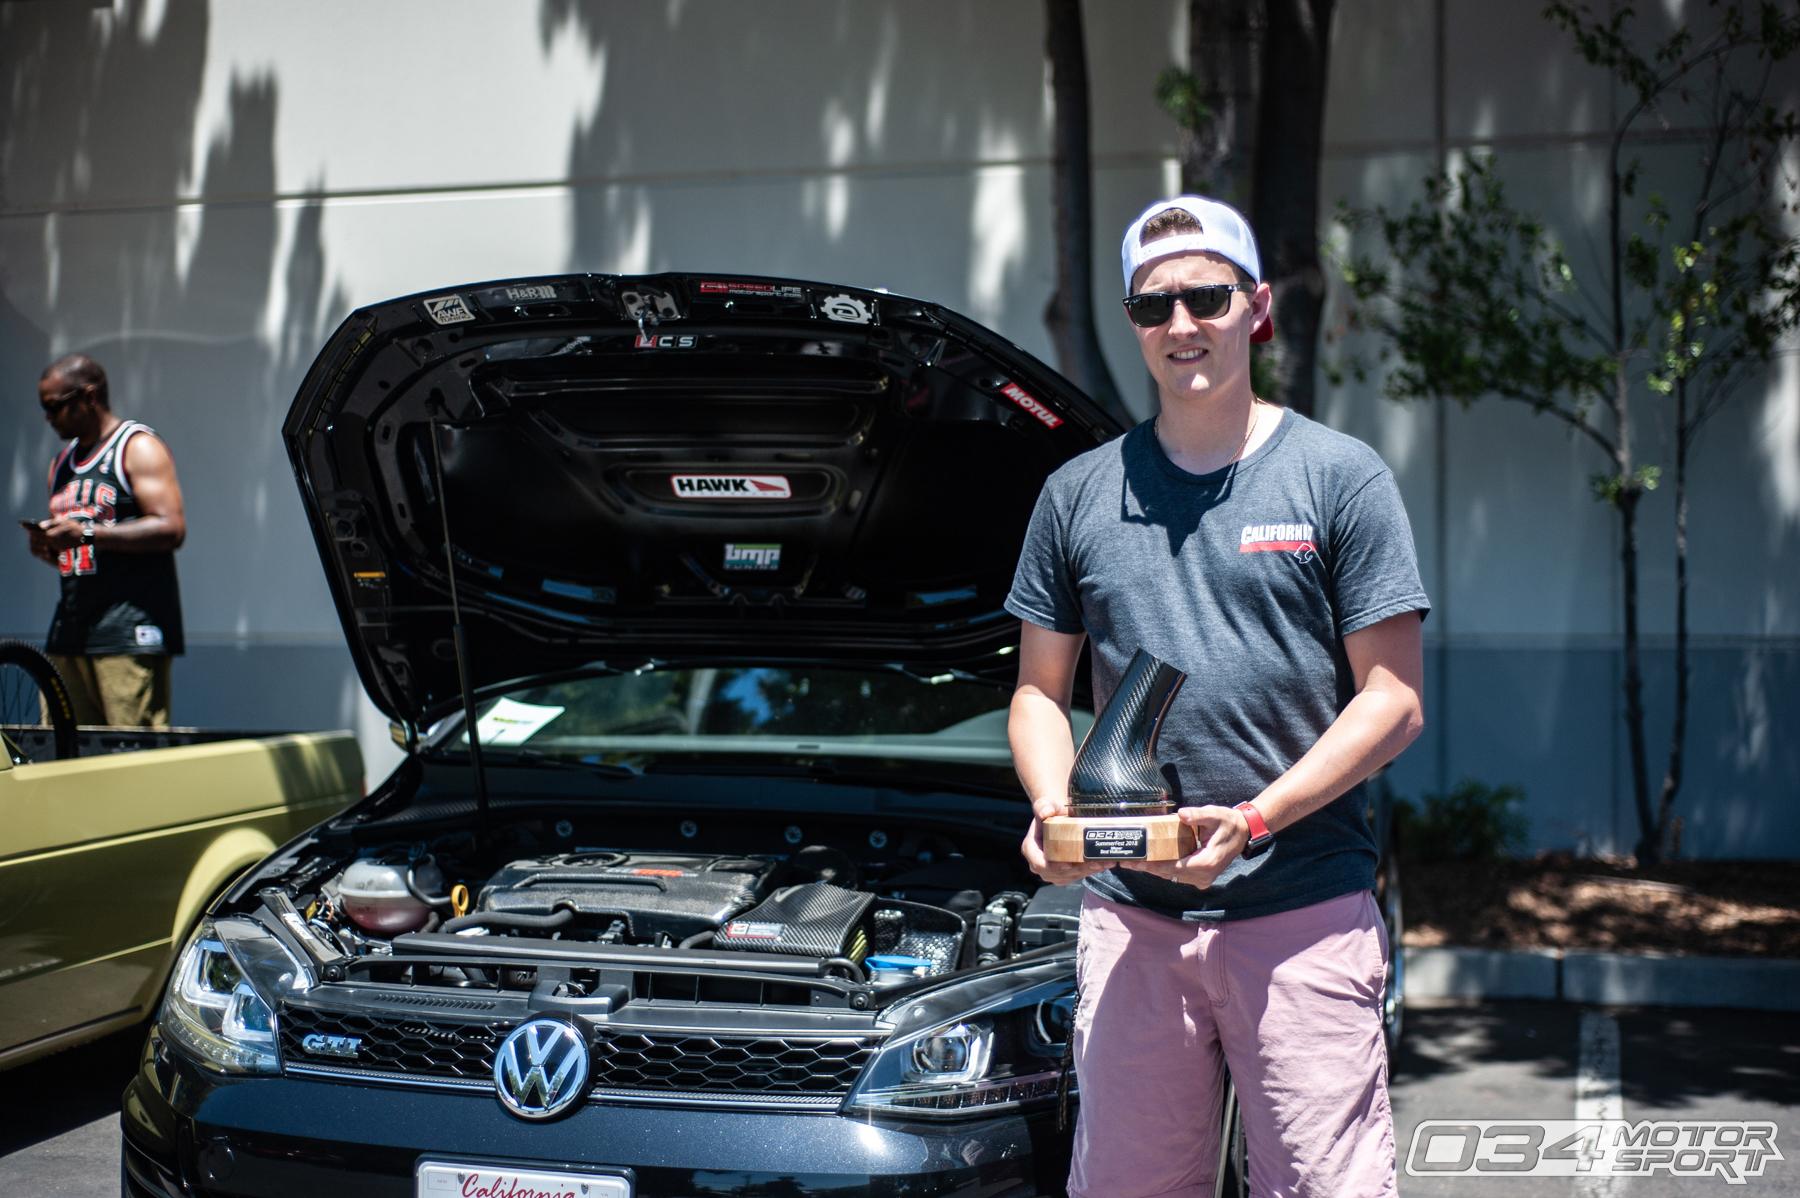 Colin Delano's Mk7 Volkswagen GTI 2.0T